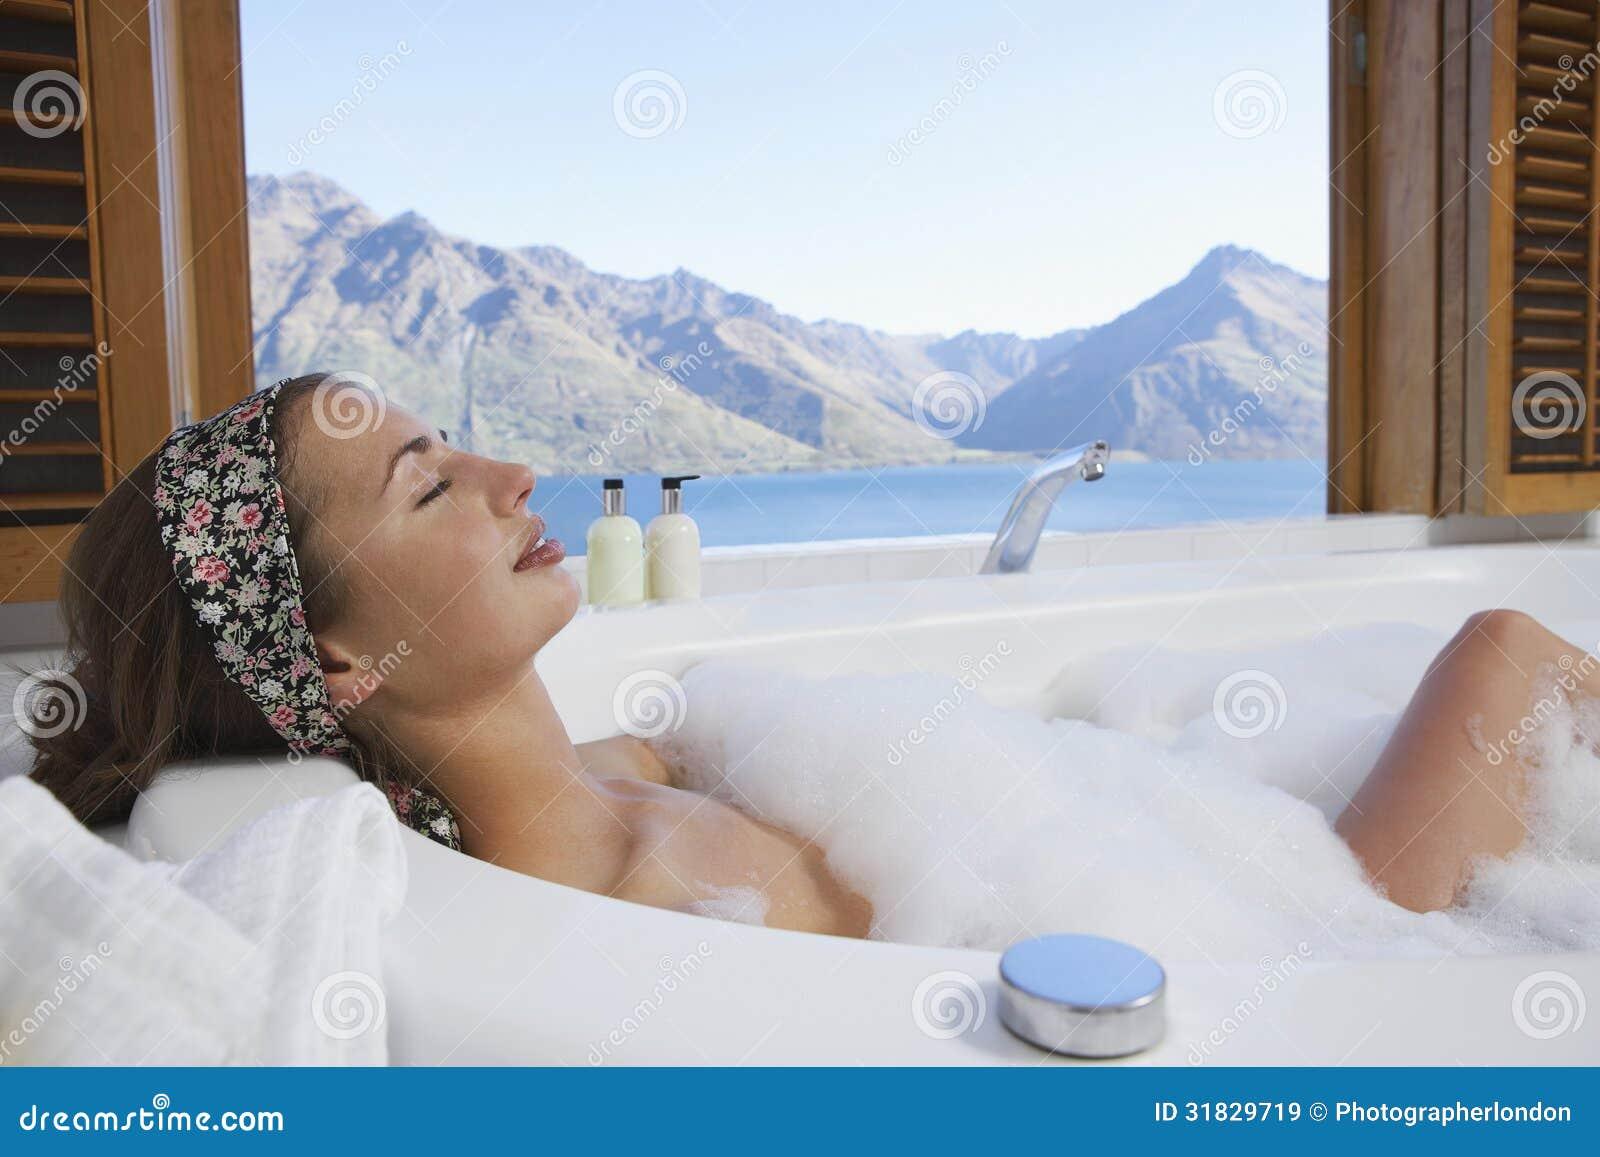 Woman In Bubble Bathtub With Mountain Lake Outside Window Stock ...